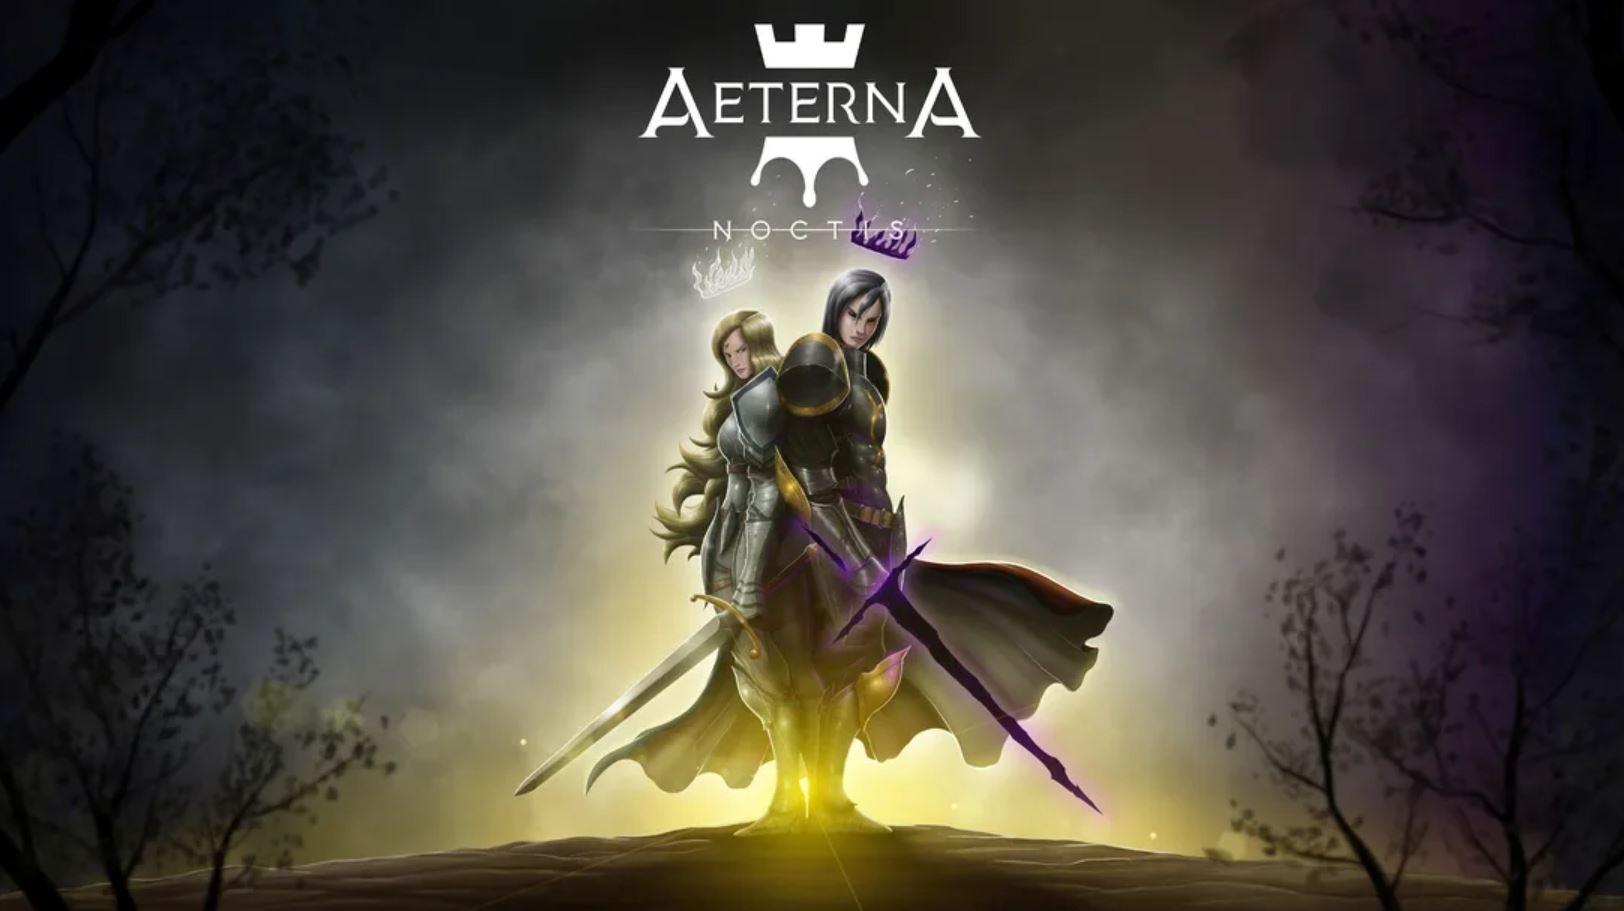 aeterna-noctis-ps5-ps4-news-reviews-videos